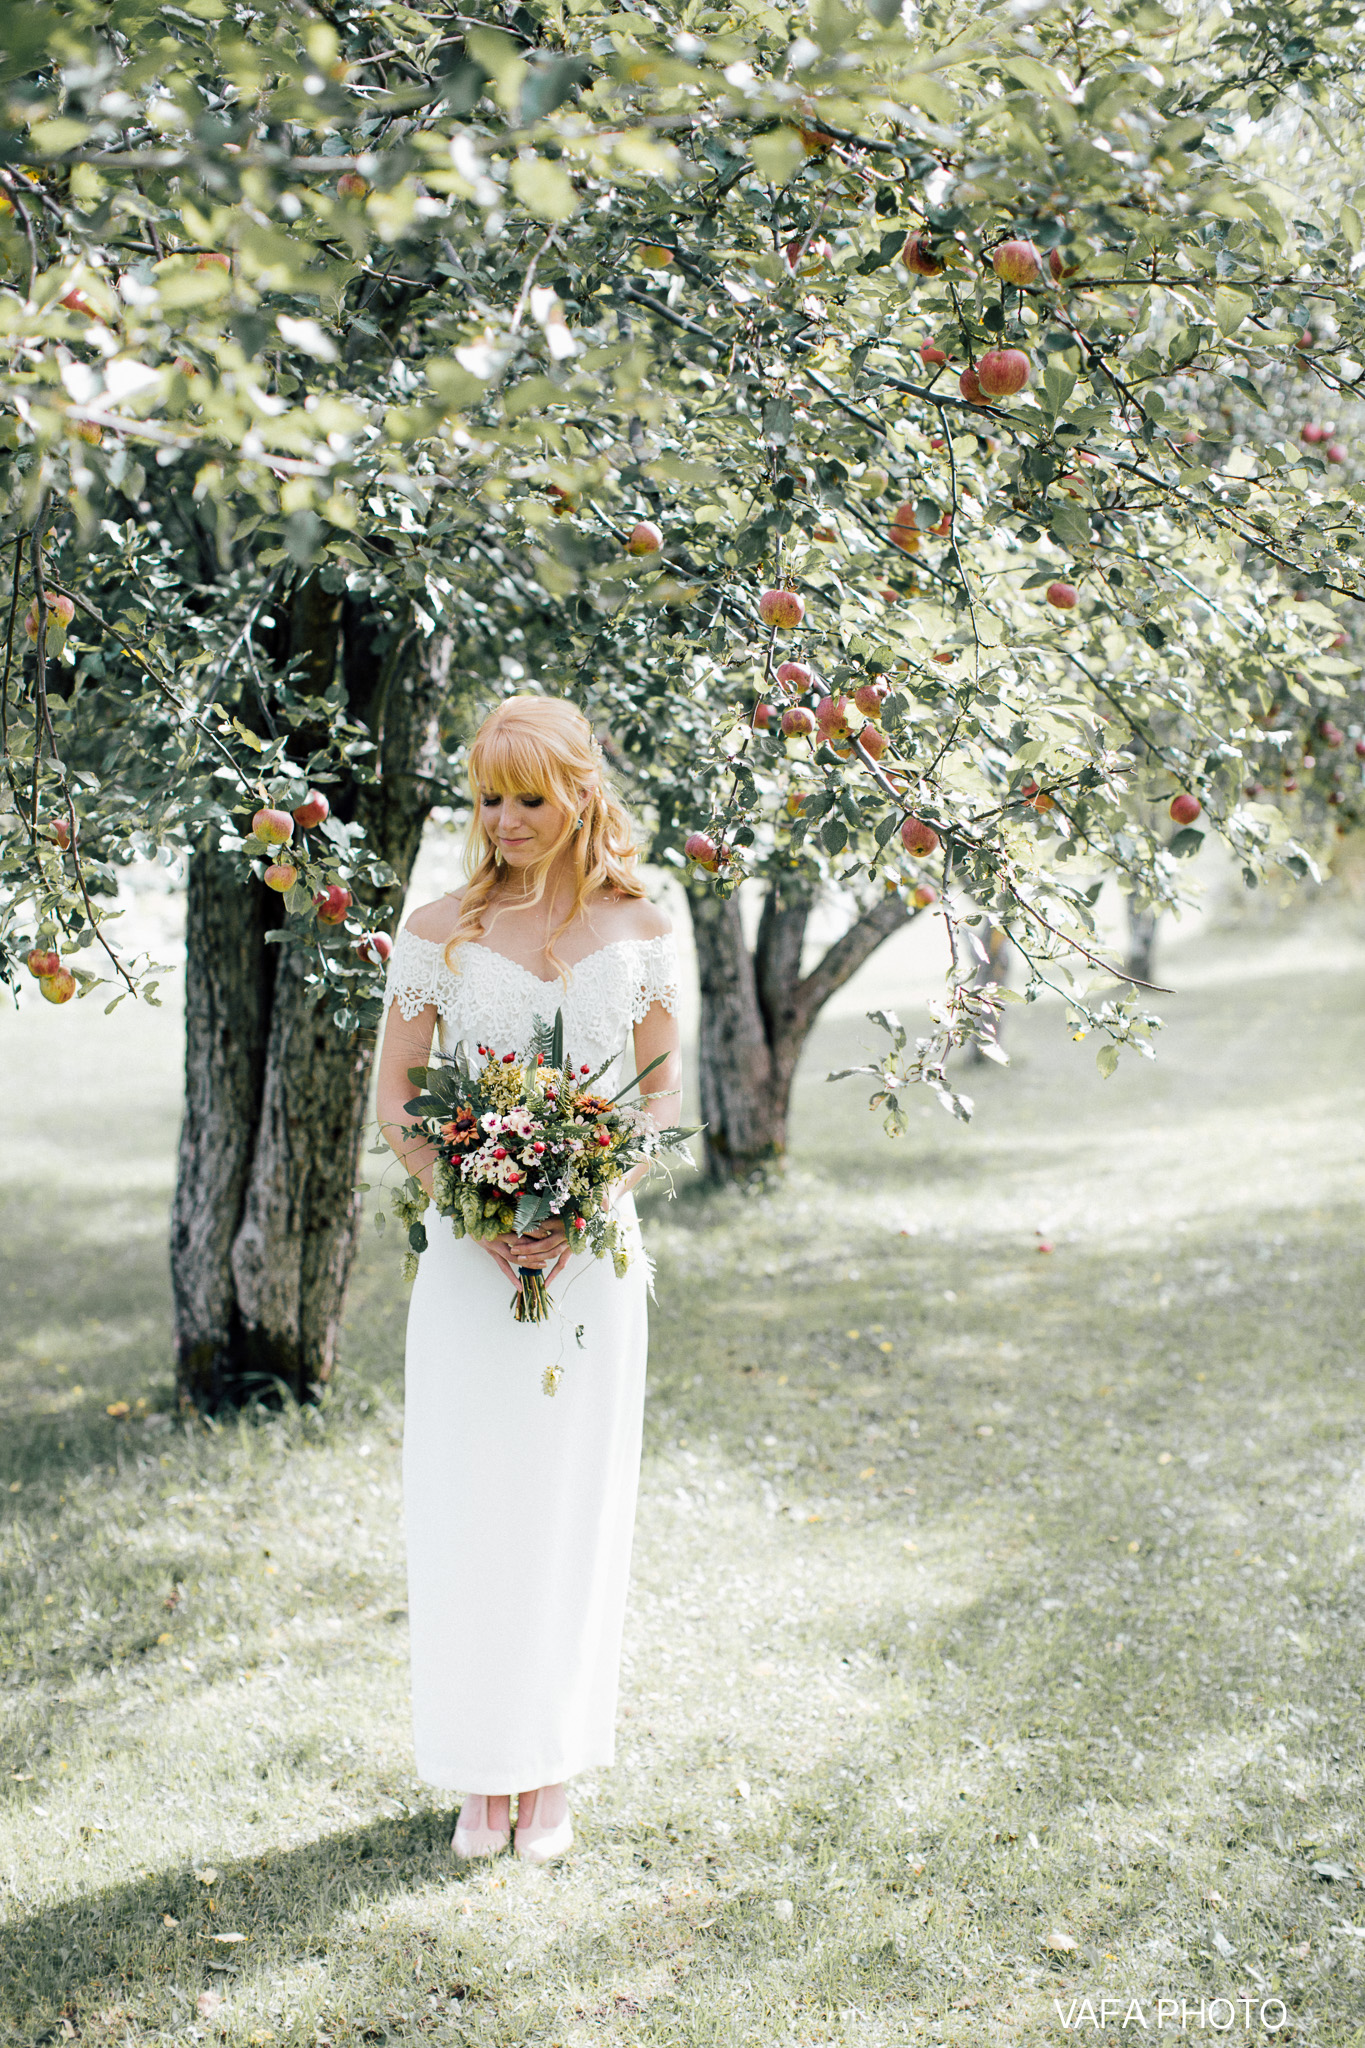 Belsolda-Farm-Wedding-Christy-Eric-Vafa-Photo-122.jpg